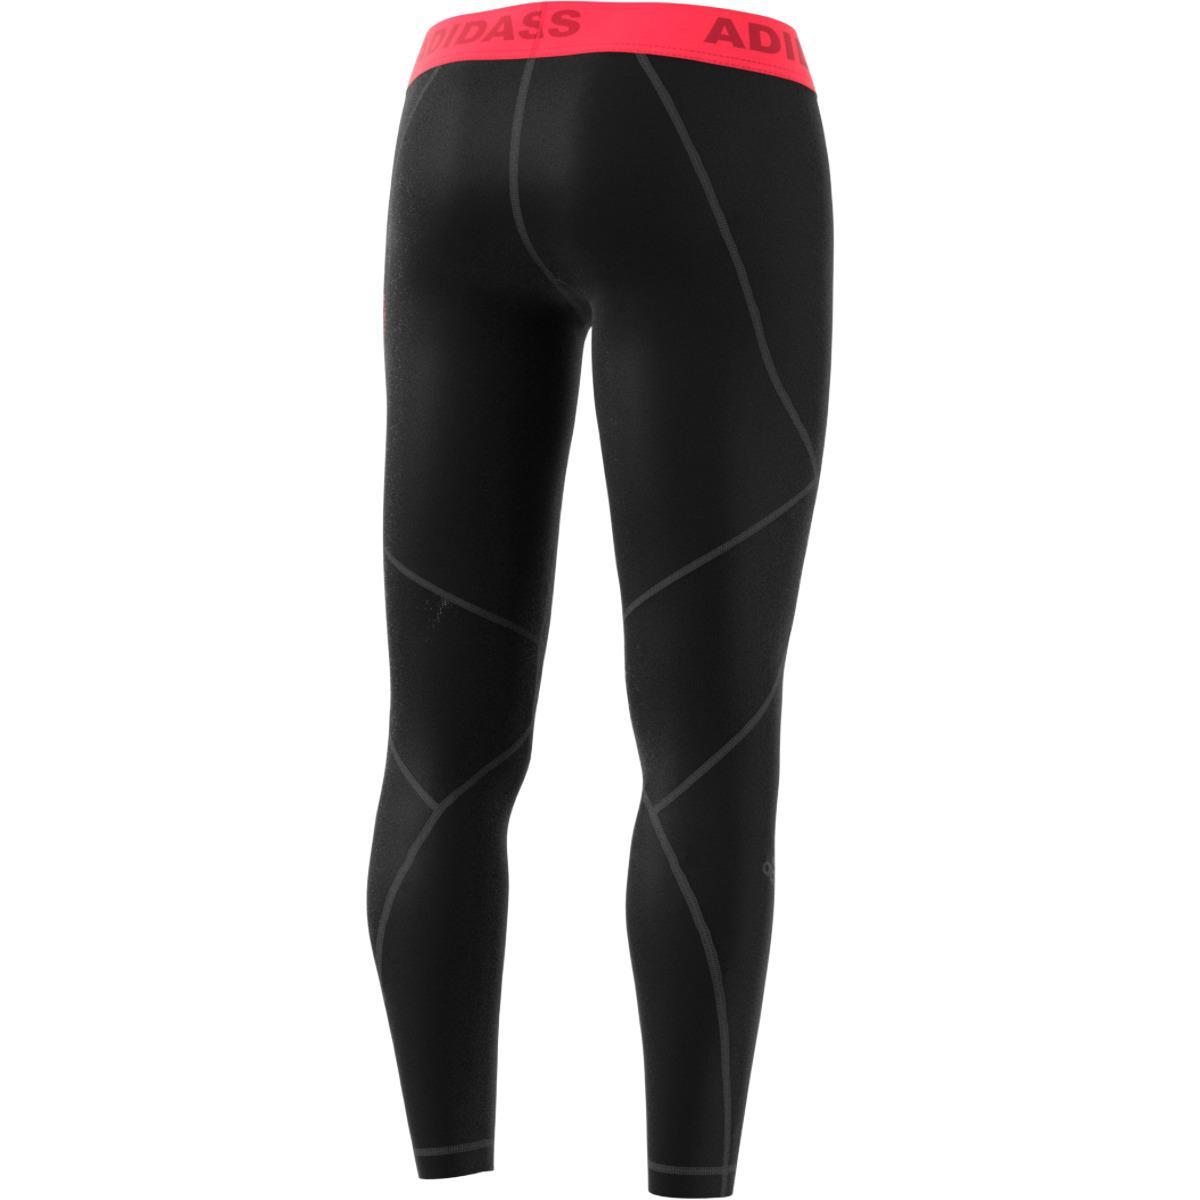 7f647c7c3caf0 Adidas - Black Ask Spr leggings - Lyst. View fullscreen